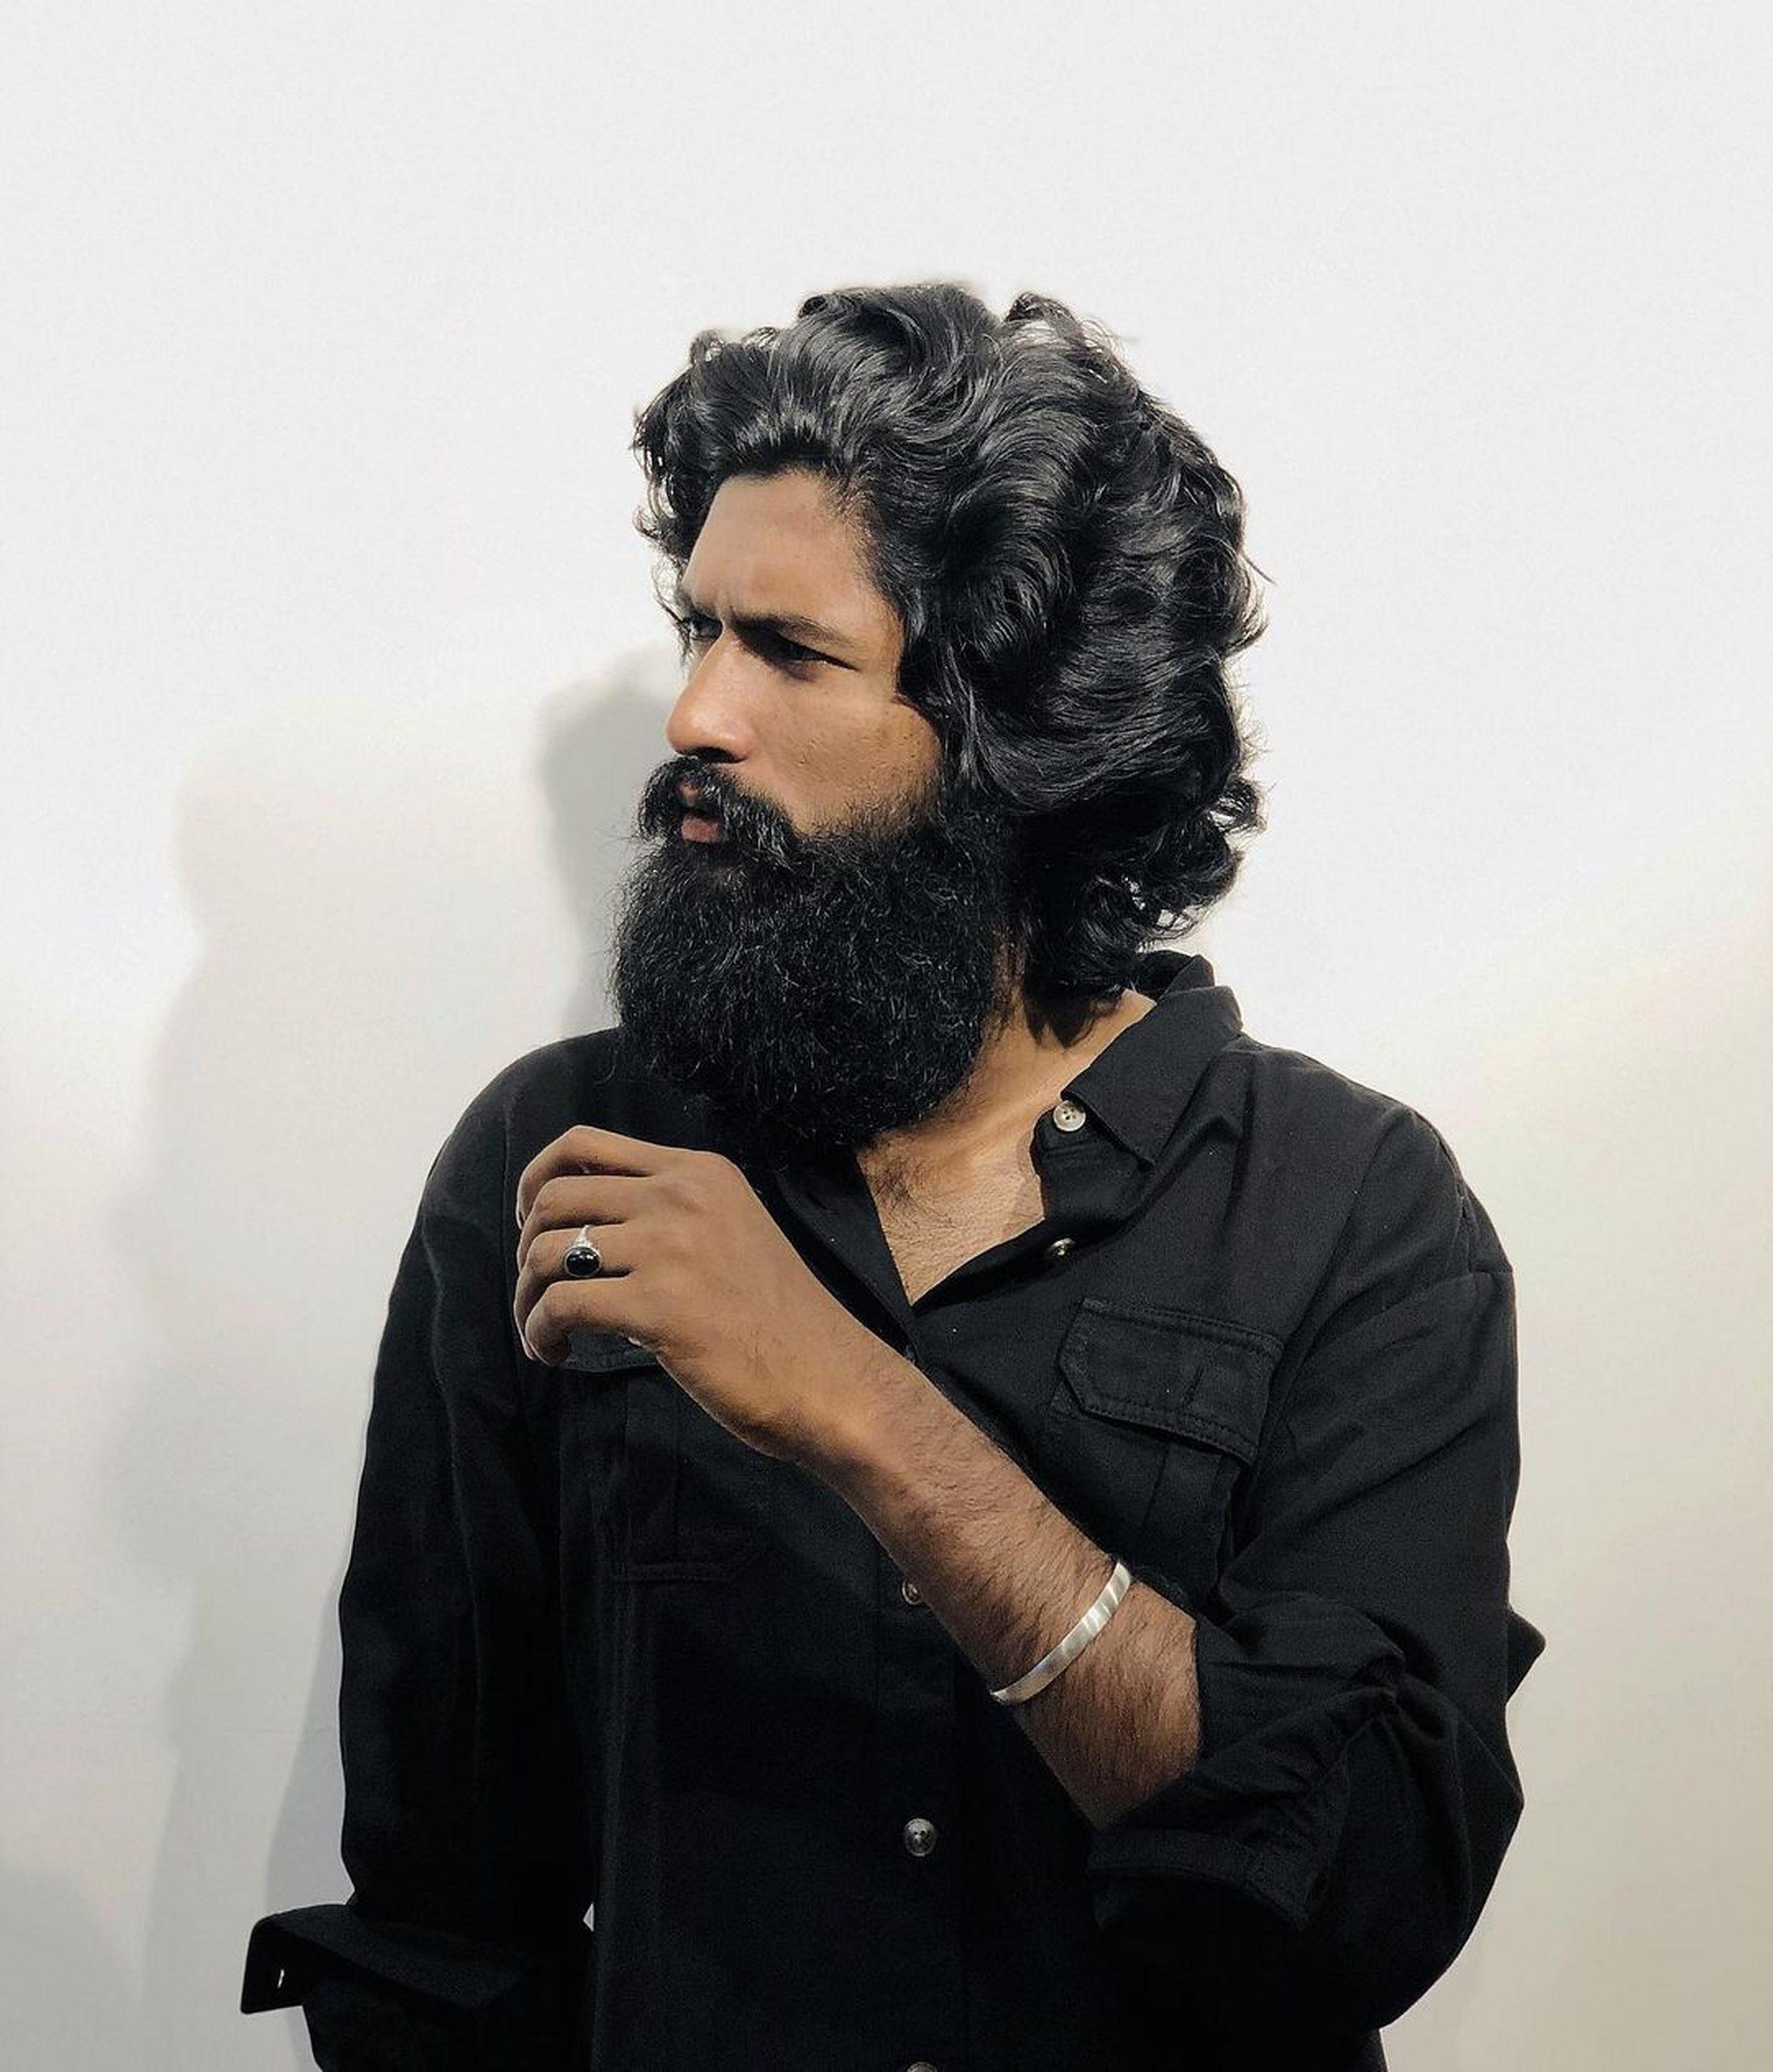 Boy with beard posing